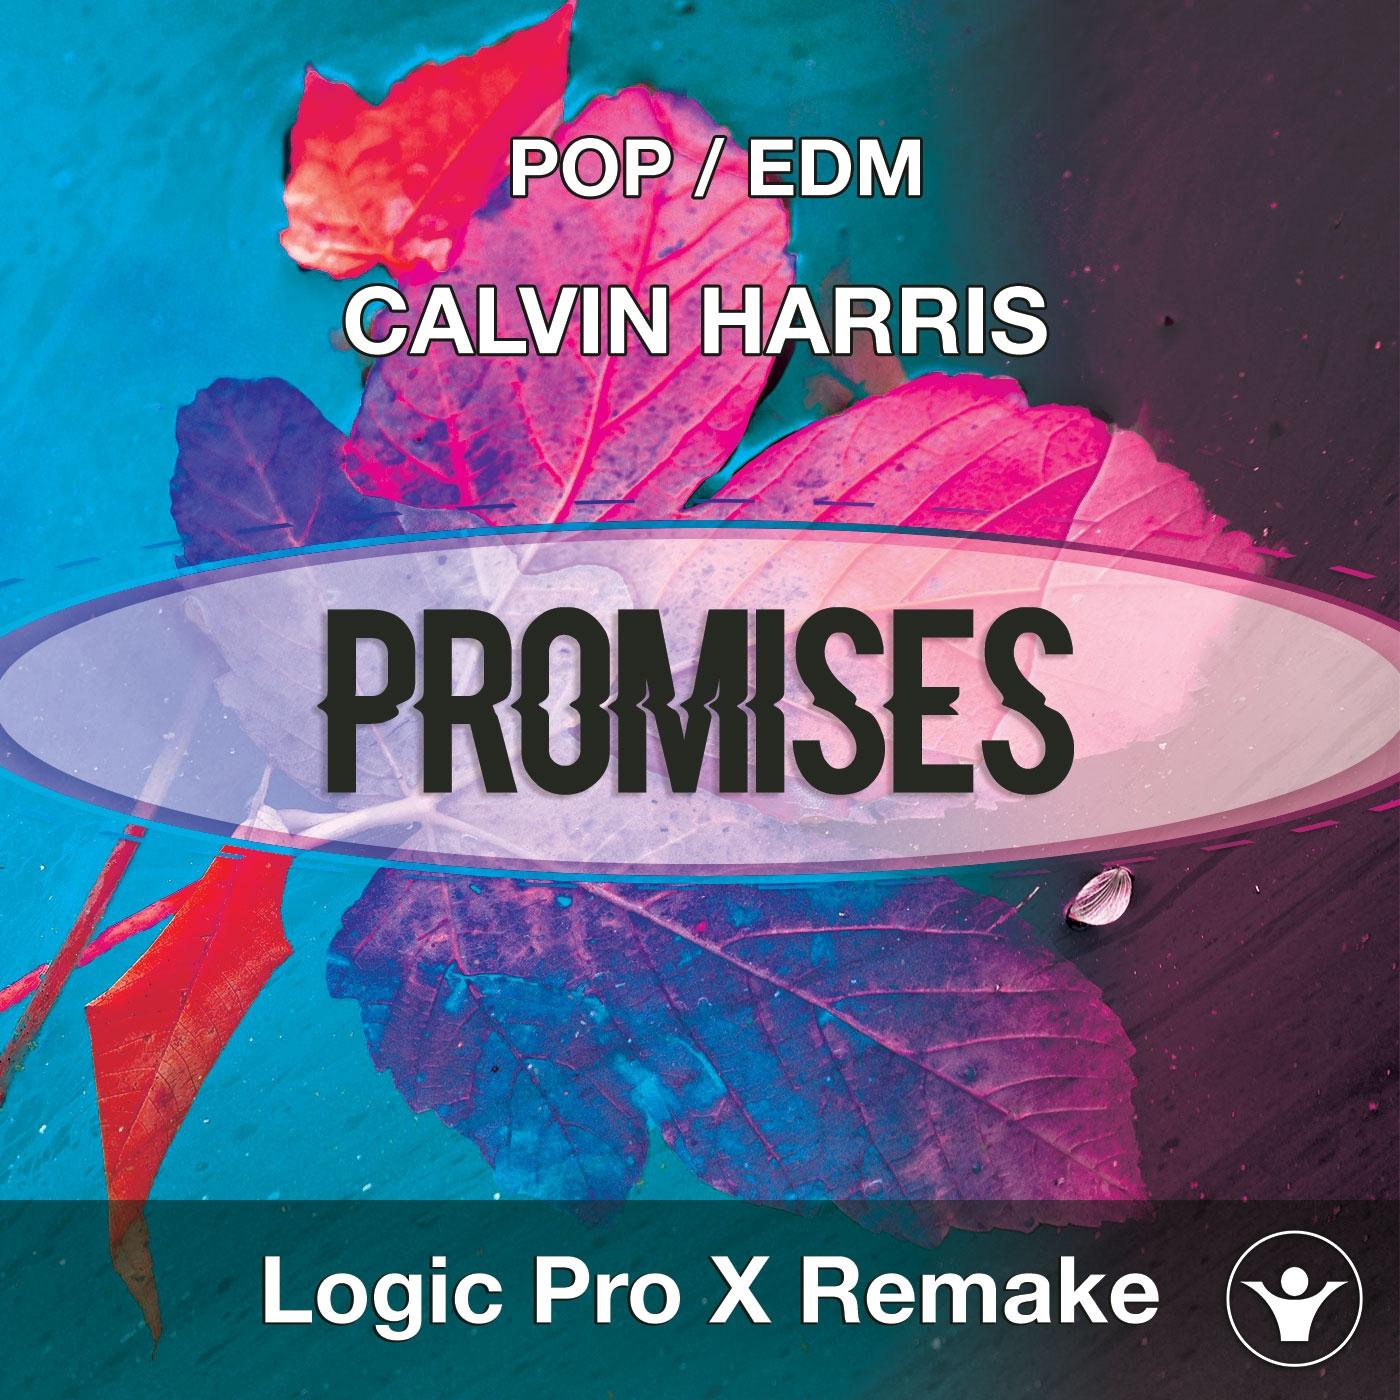 Promises (Calvin Harris, Sam Smith) - Logic Pro X Remake Template